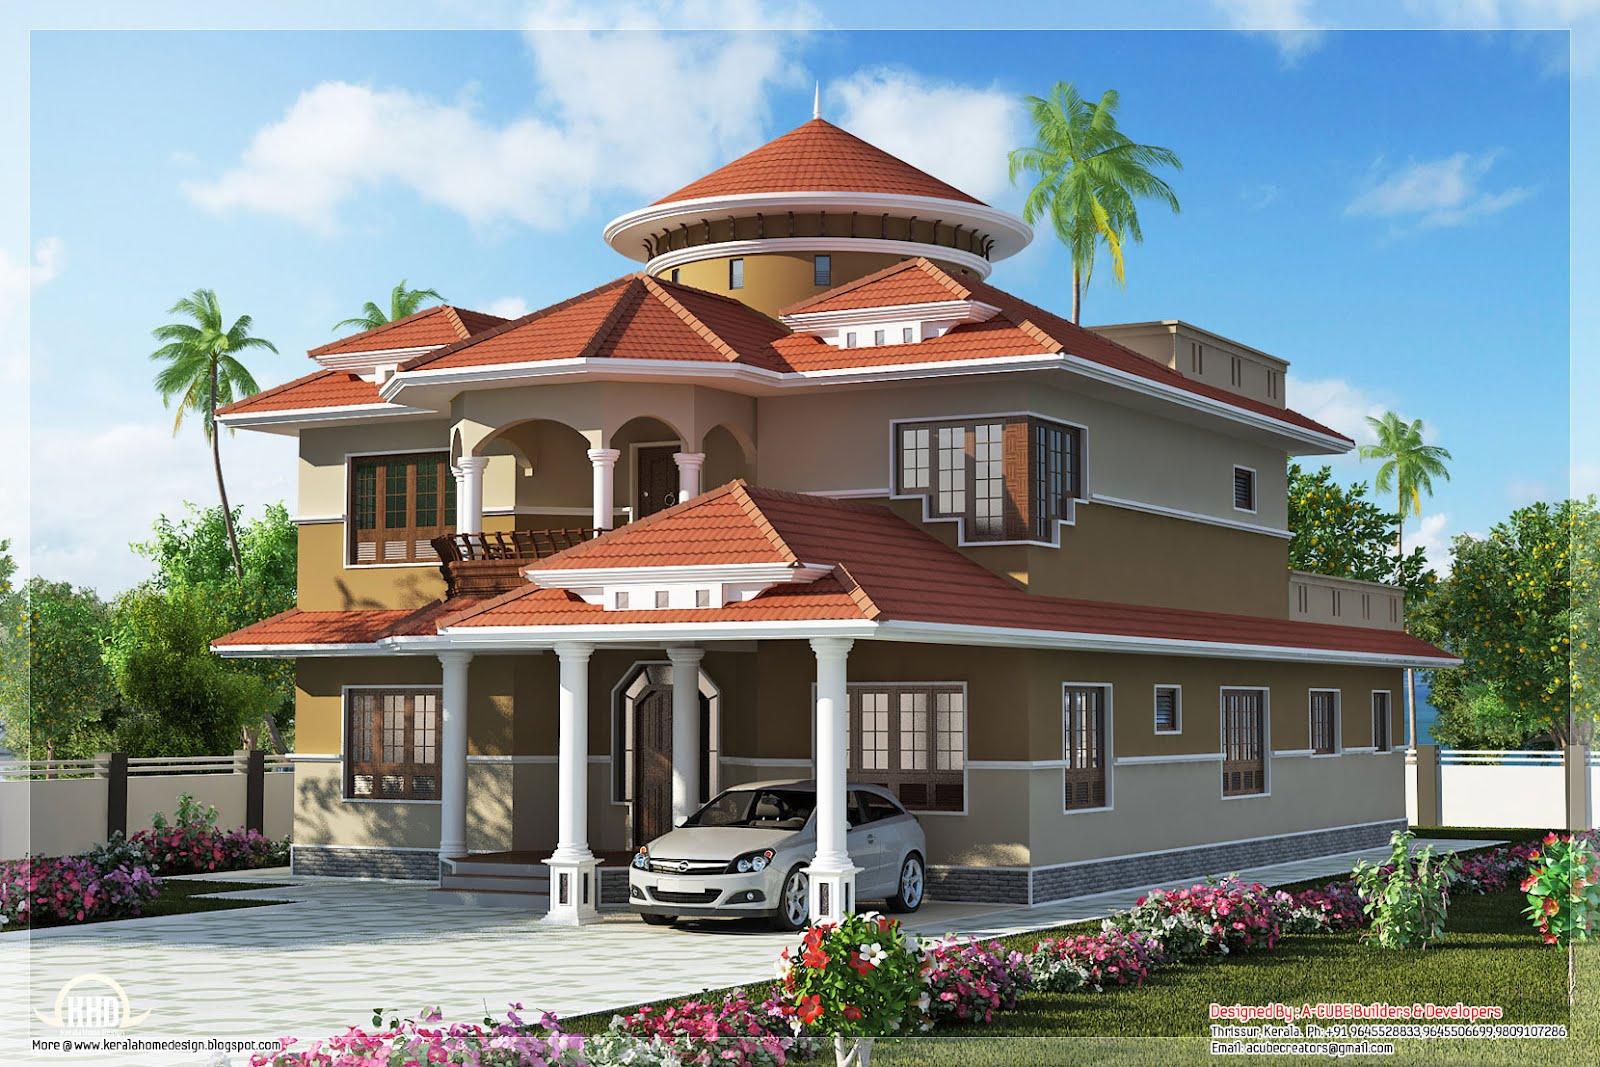 Beautiful Dream Home Design In 2800 Sq Feet Home Appliance